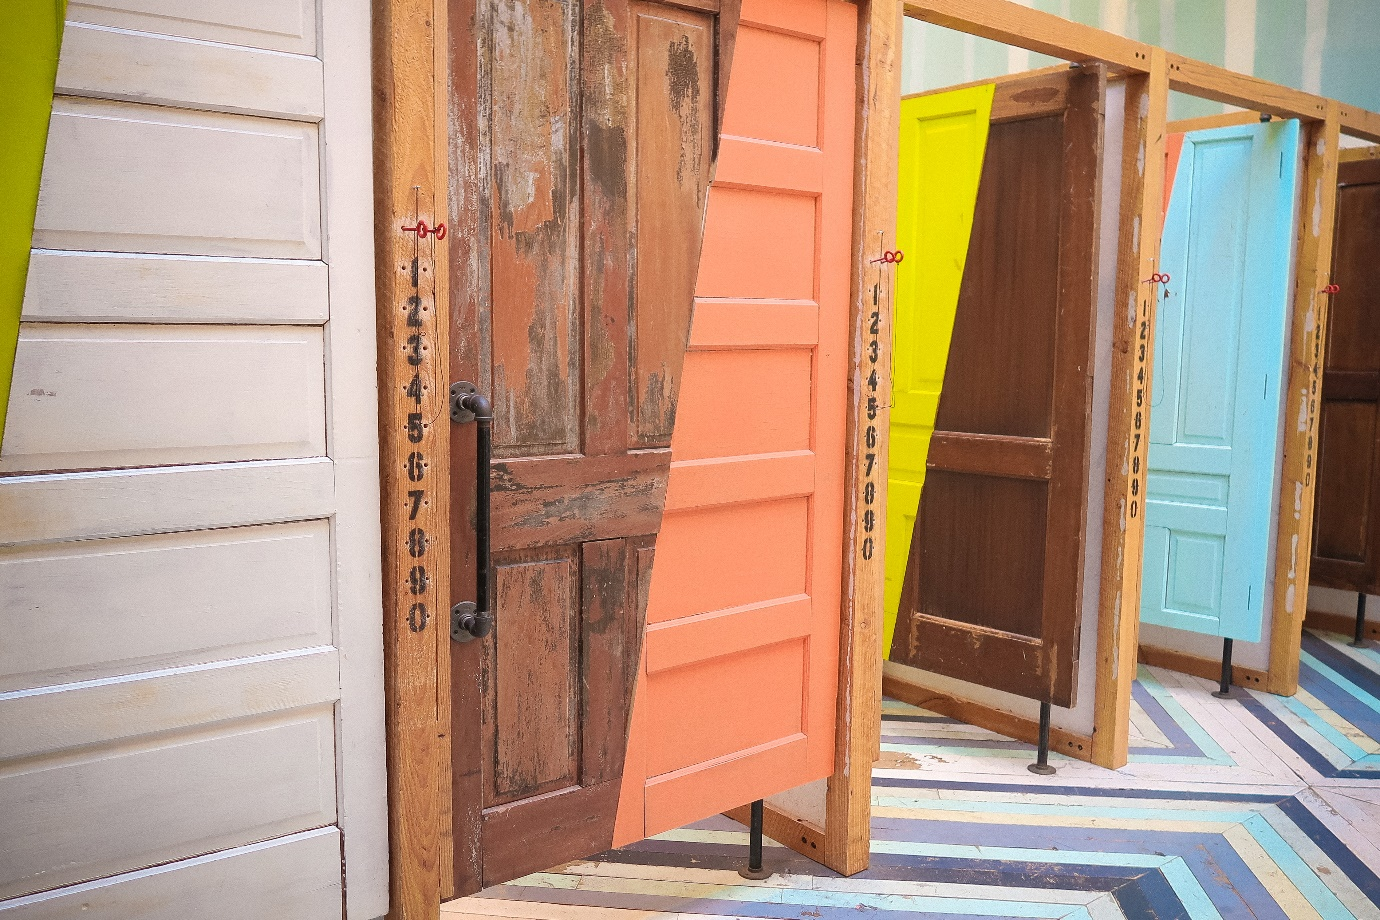 Use of Pastel Colors in Interior Design